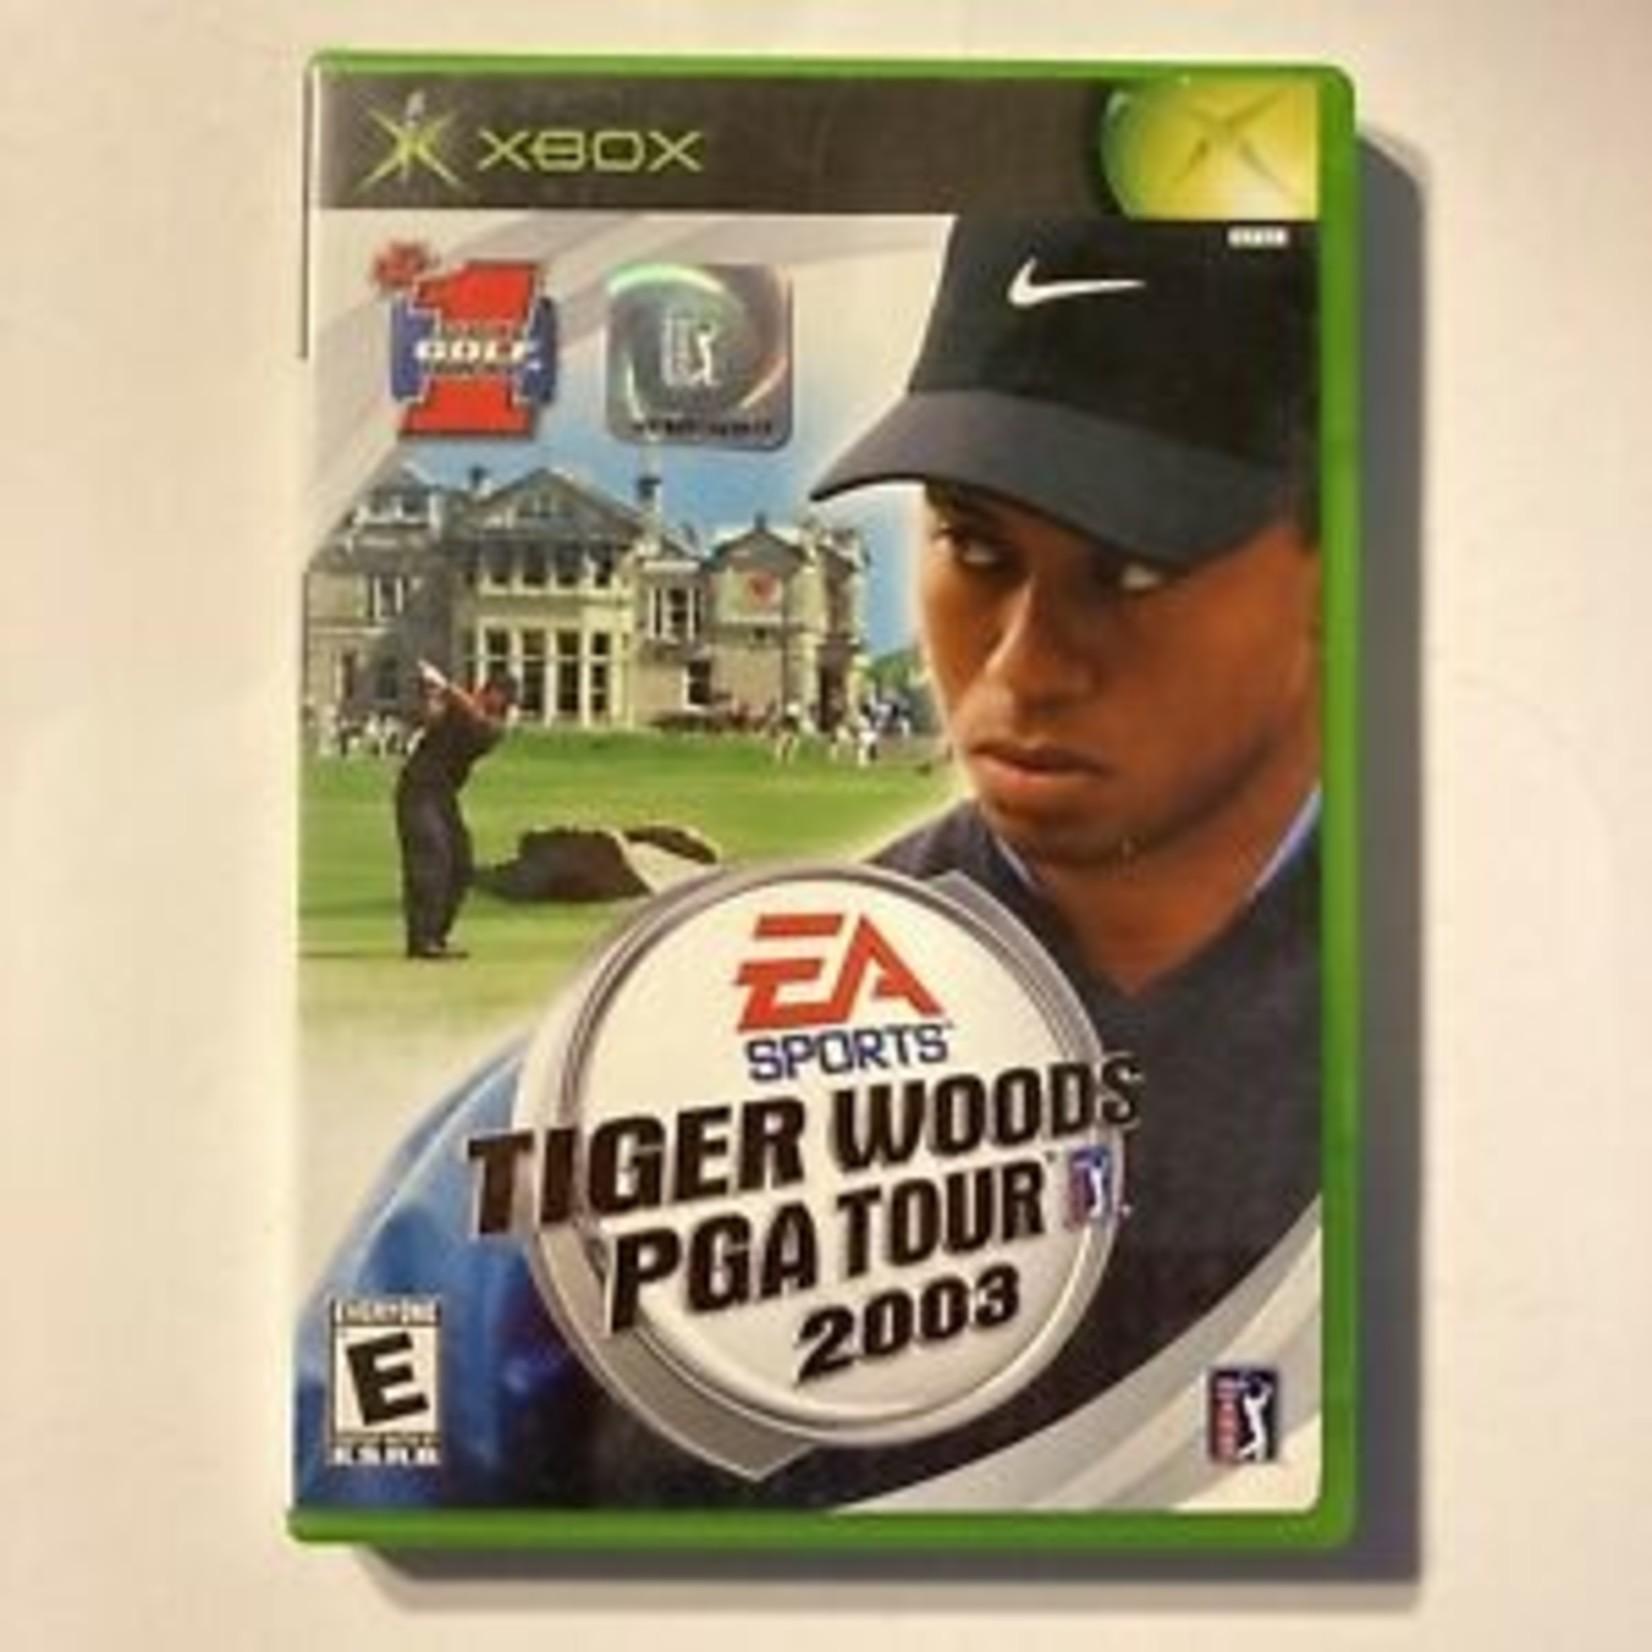 xbu-Tiger Woods 2003